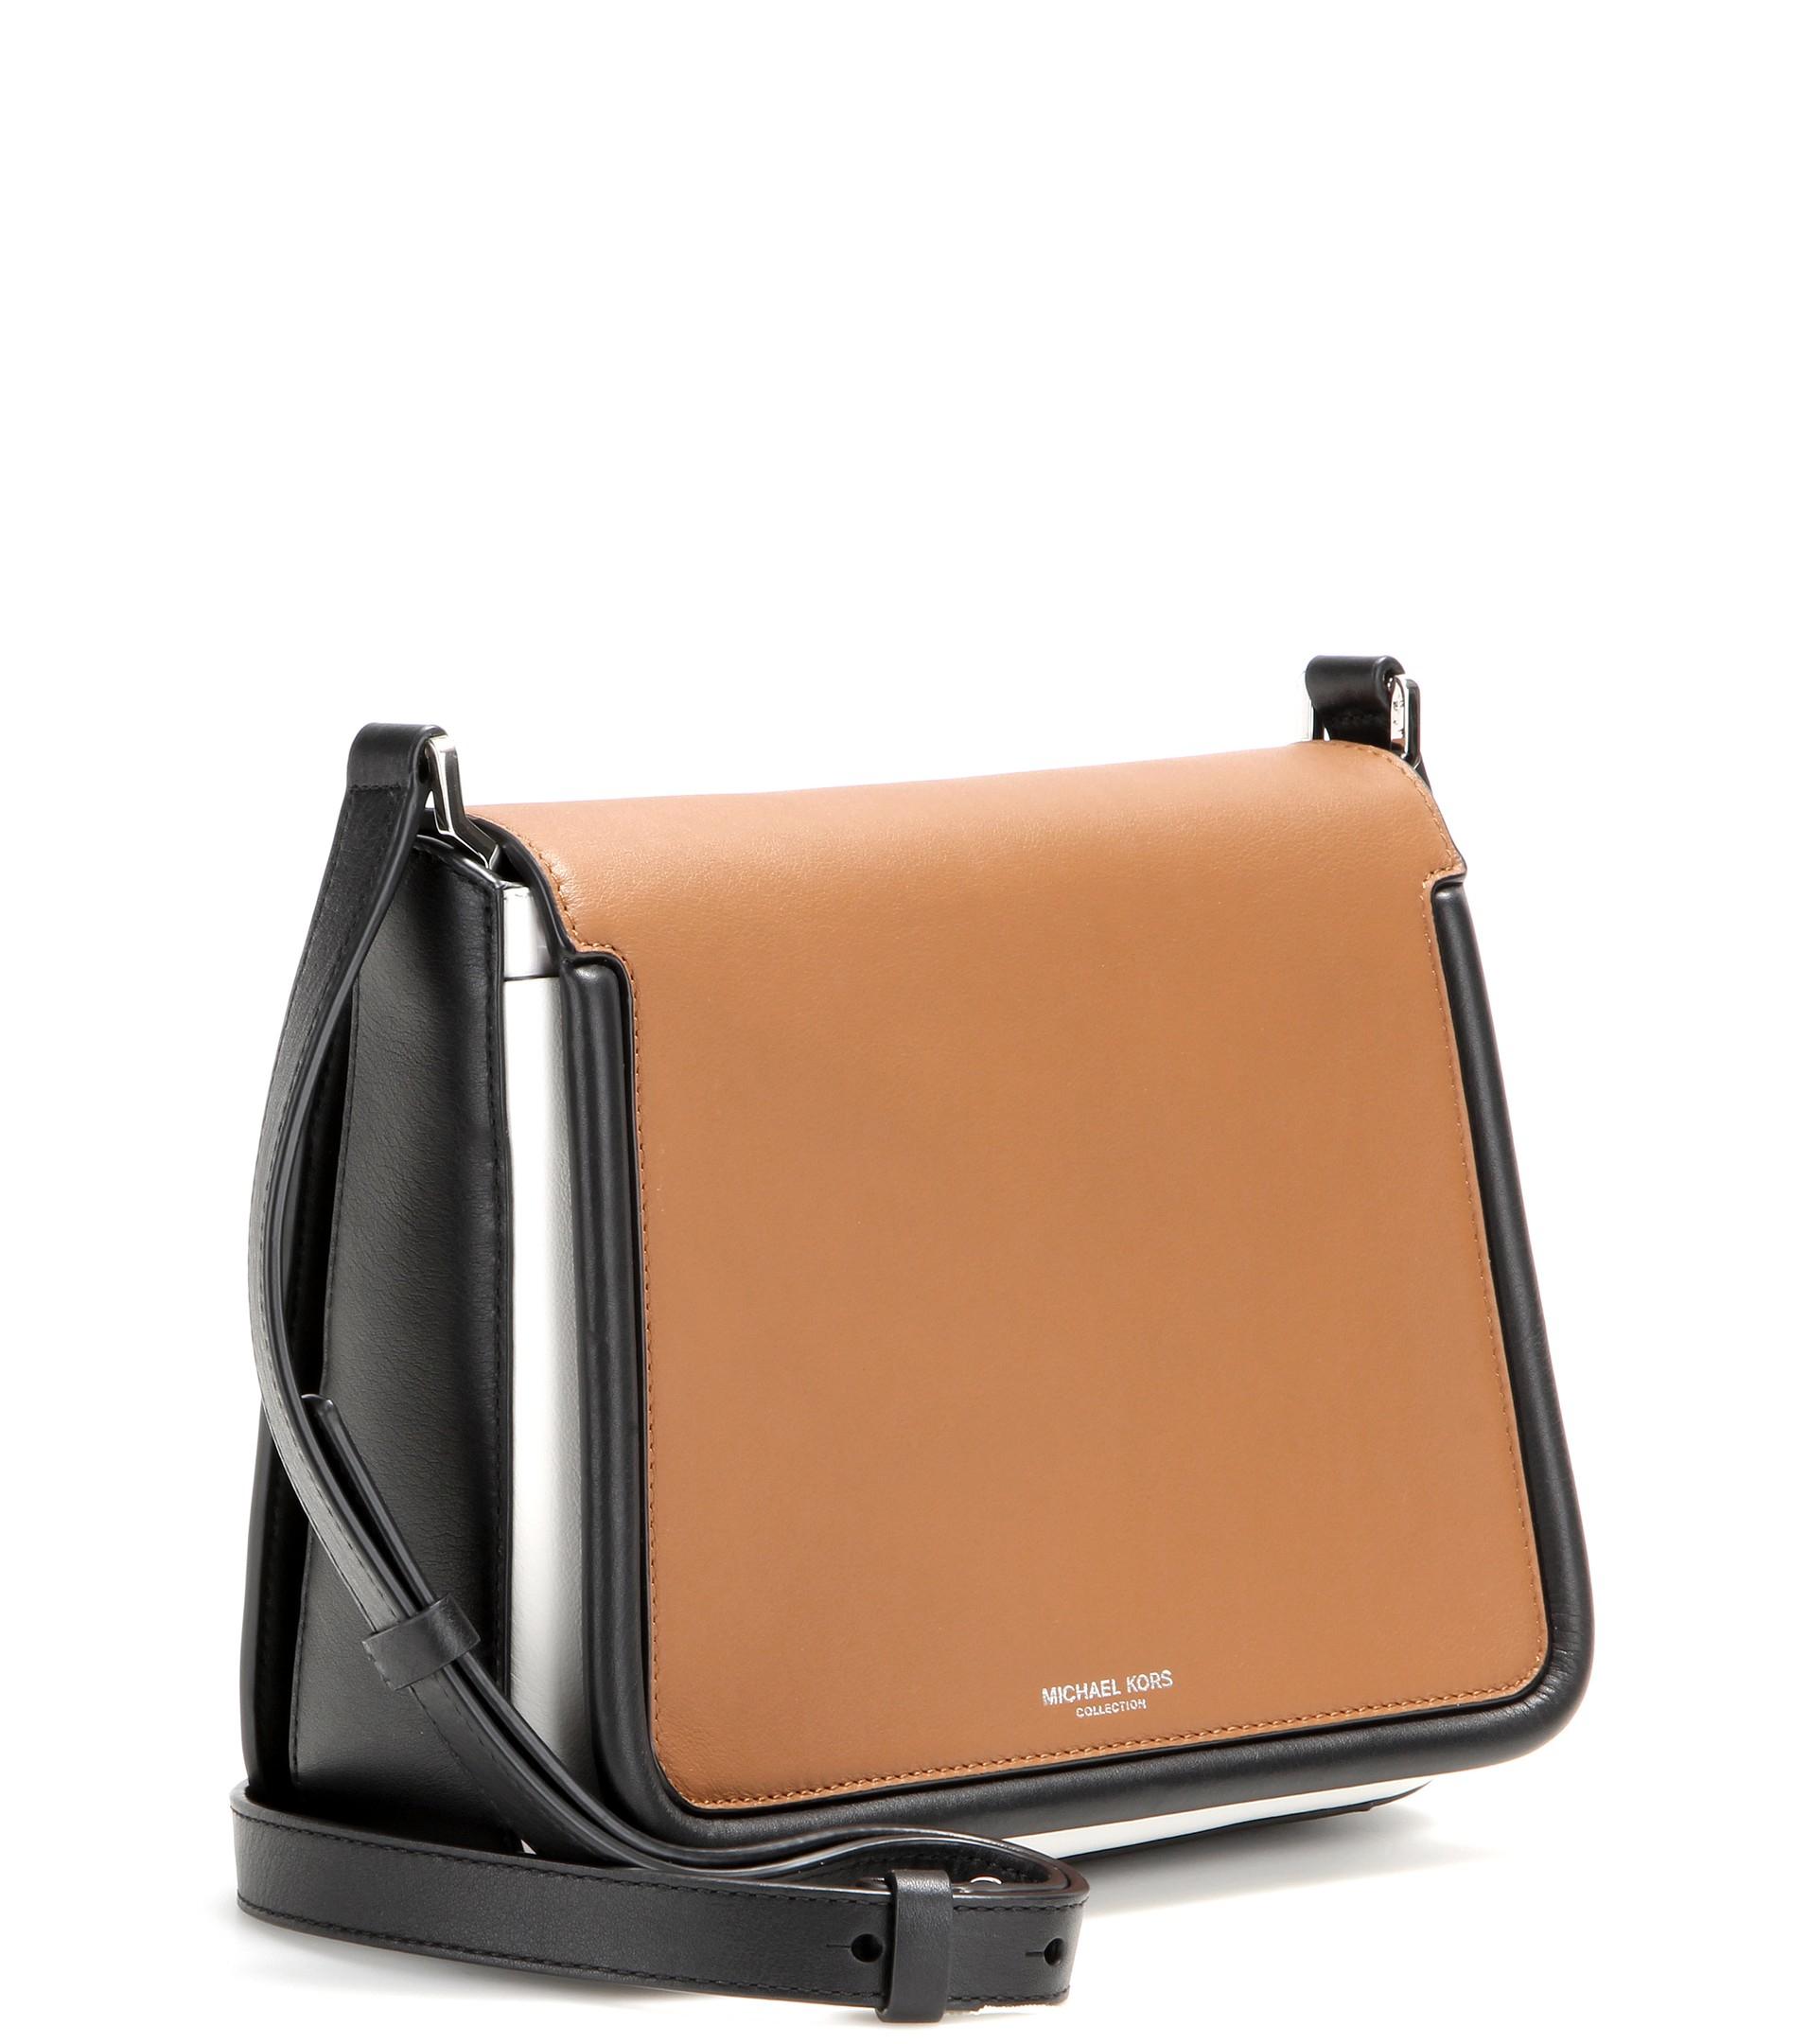 Michael Kors Collection Bags